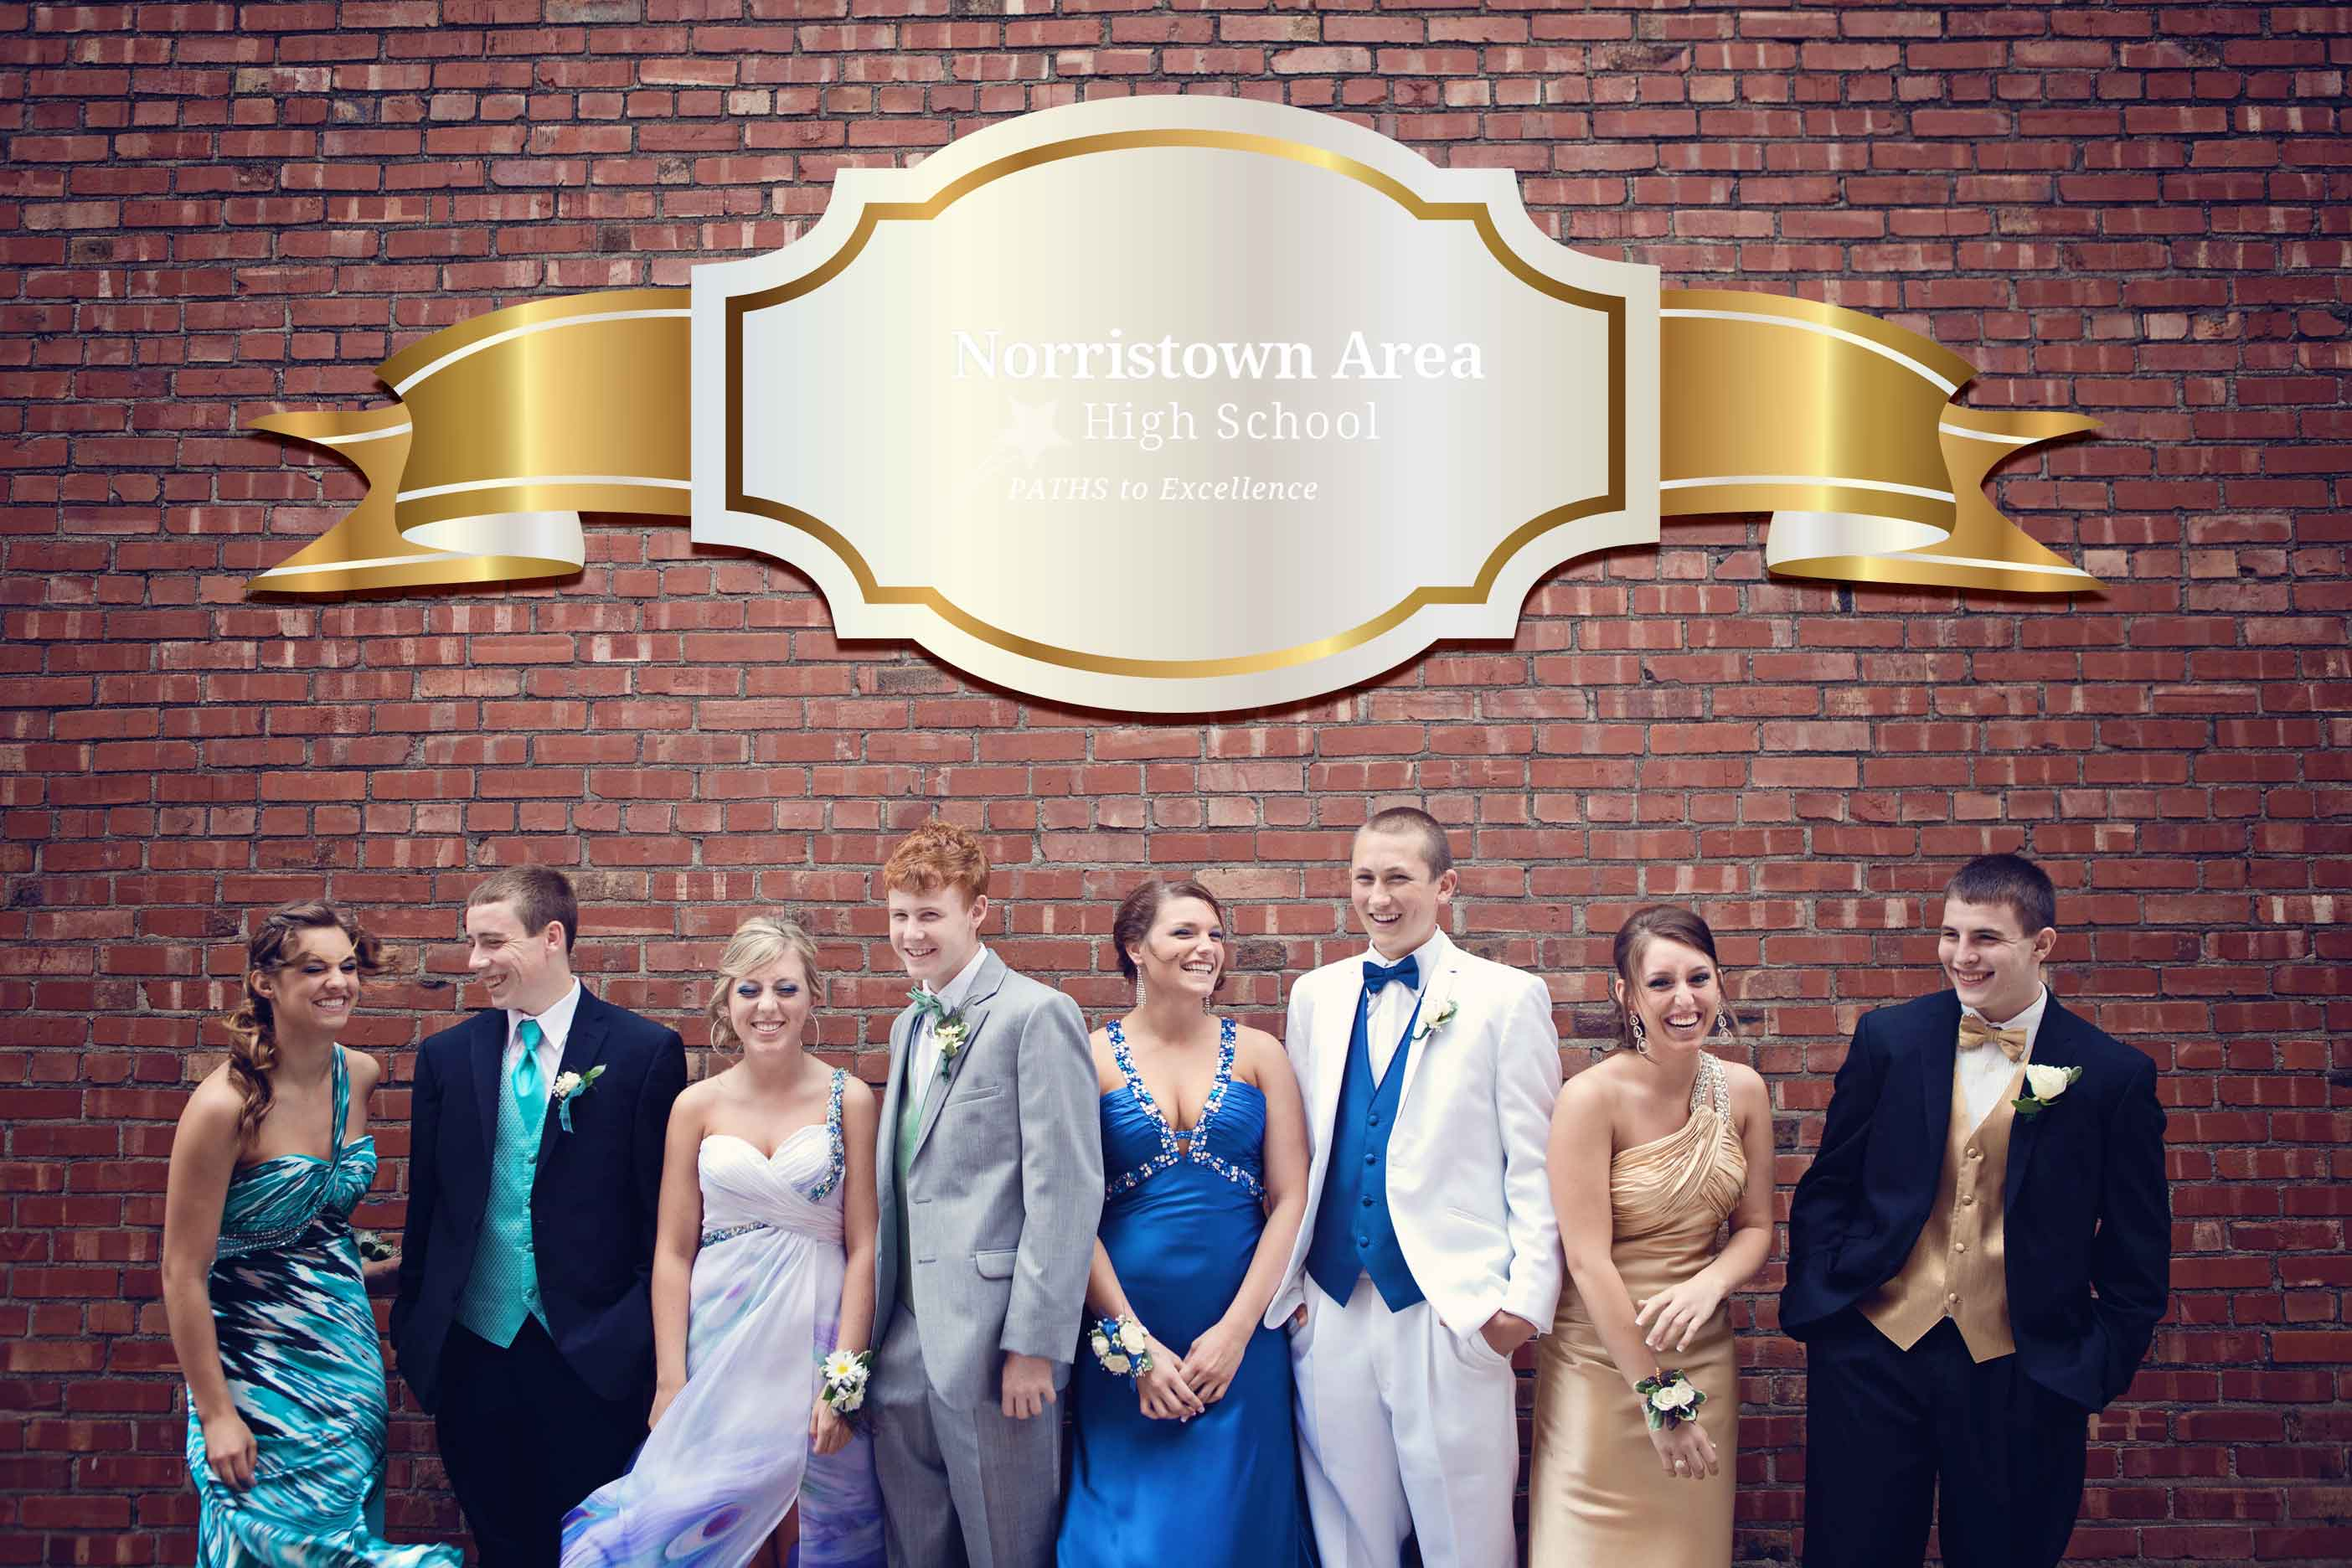 norristown high school prom